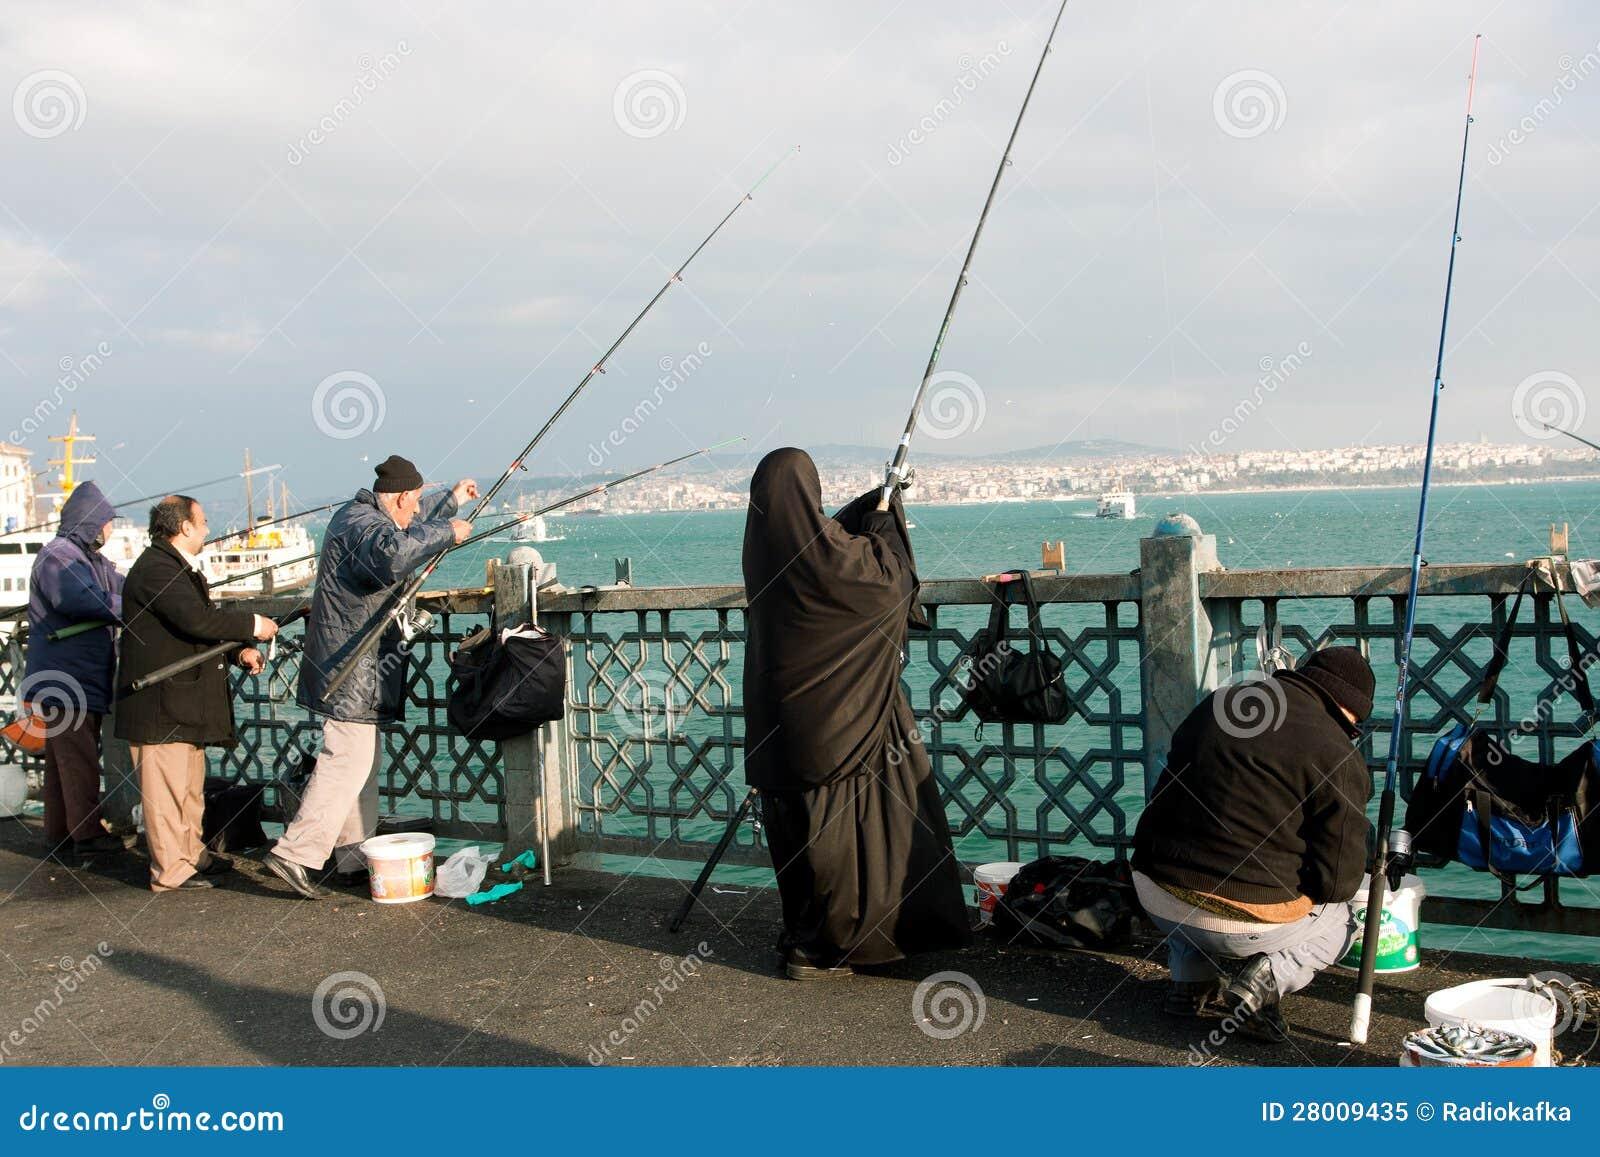 black river muslim Shia river 希亚河 shia sea 冒着波浪 to shia contract 装运合同的货物 black muslim (美国)黑人穆斯林运动的成员。 muslim culture 伊斯兰文化 伊斯文化.